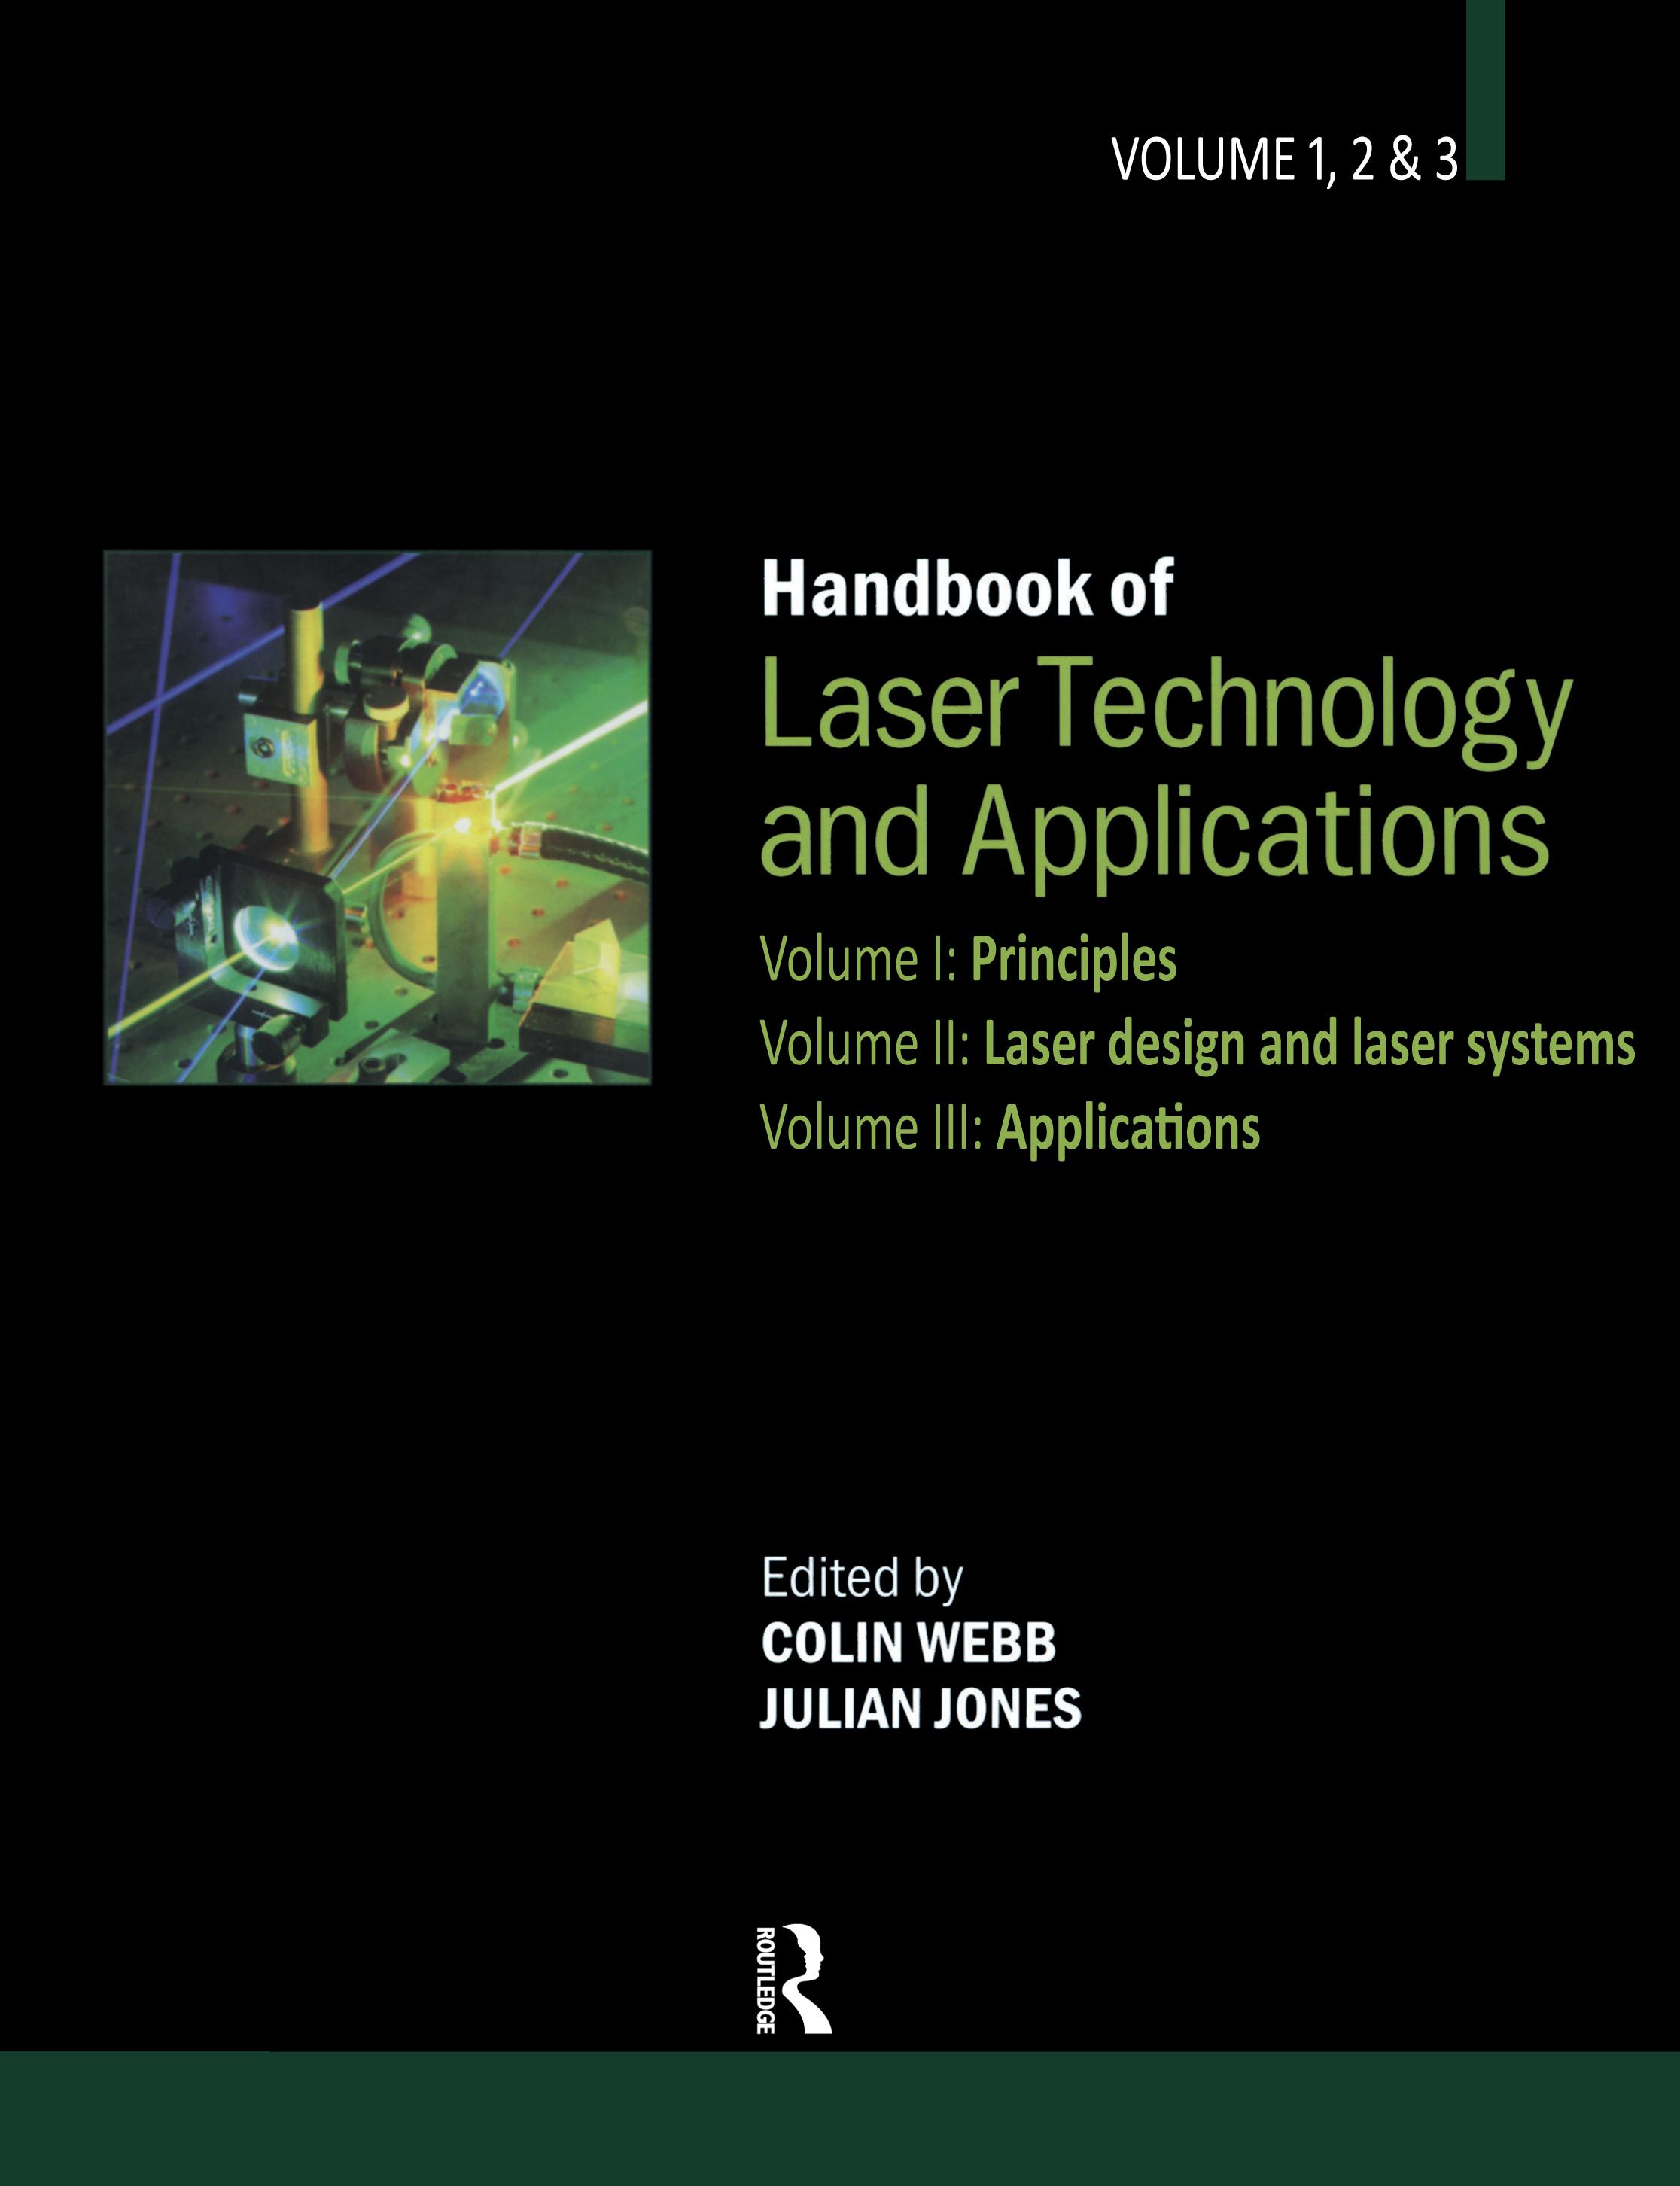 Handbook of Laser Technology and Applications (Three- Volume Set)